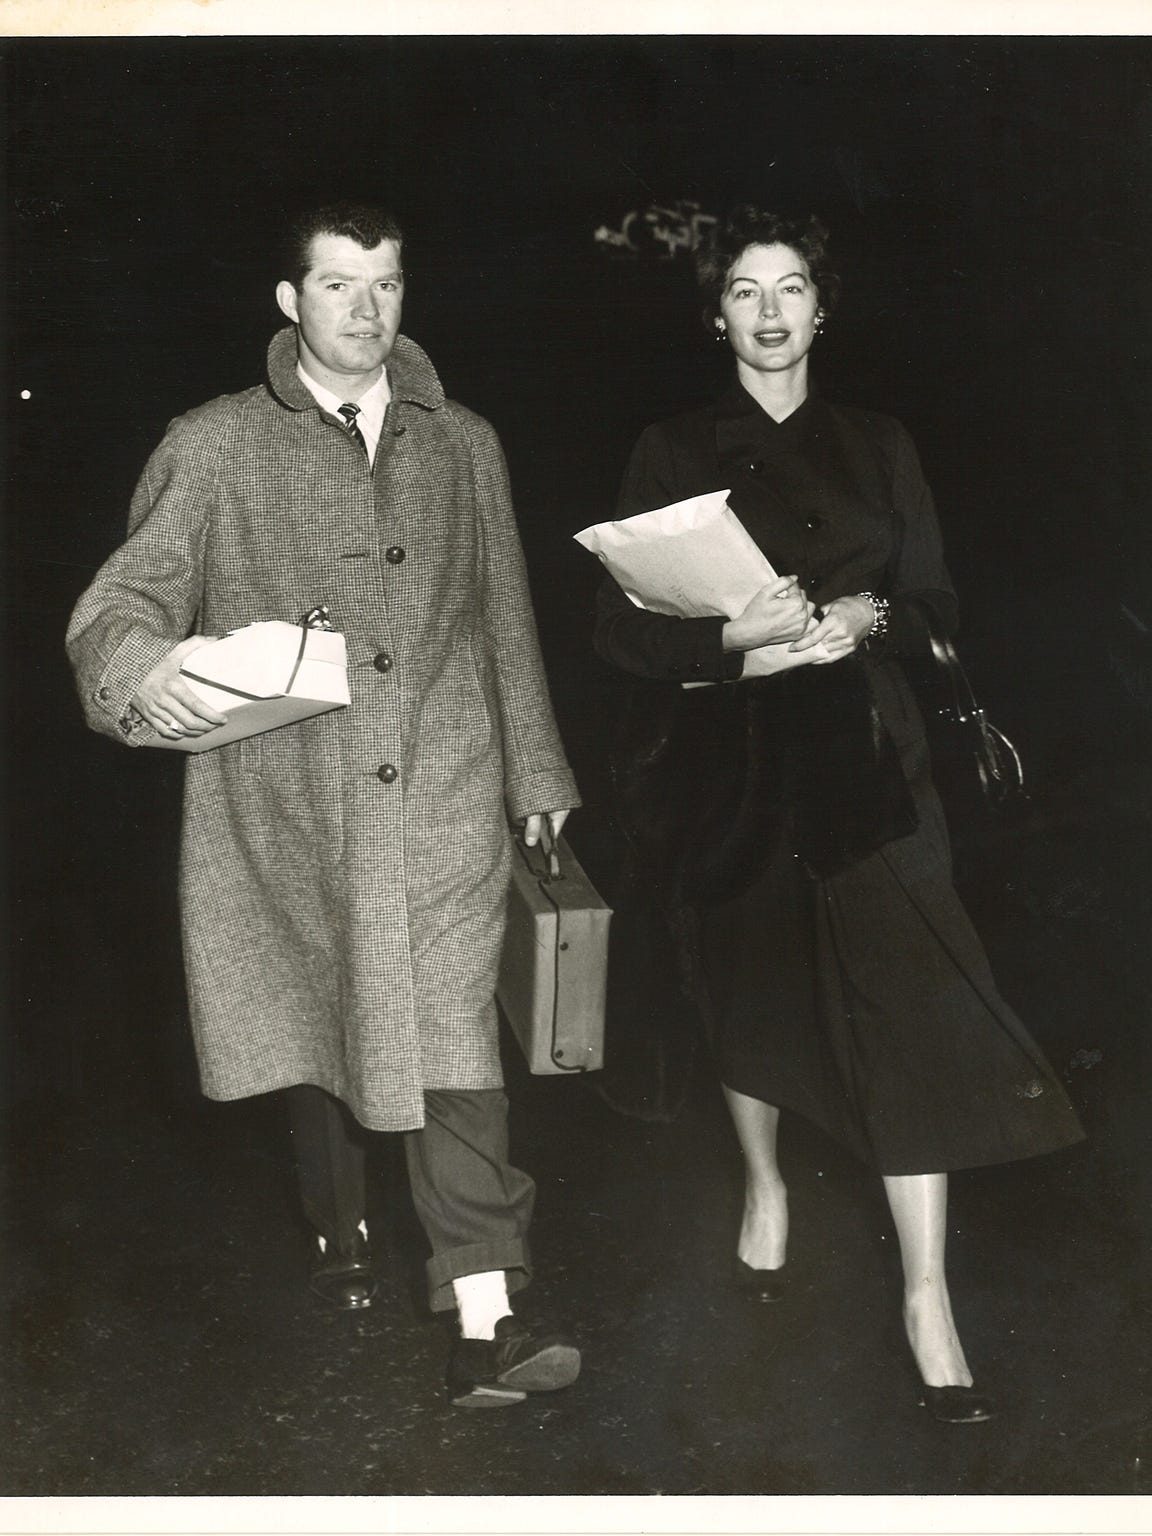 Jim Mahoney takes Ava Gardner to the airport to grab